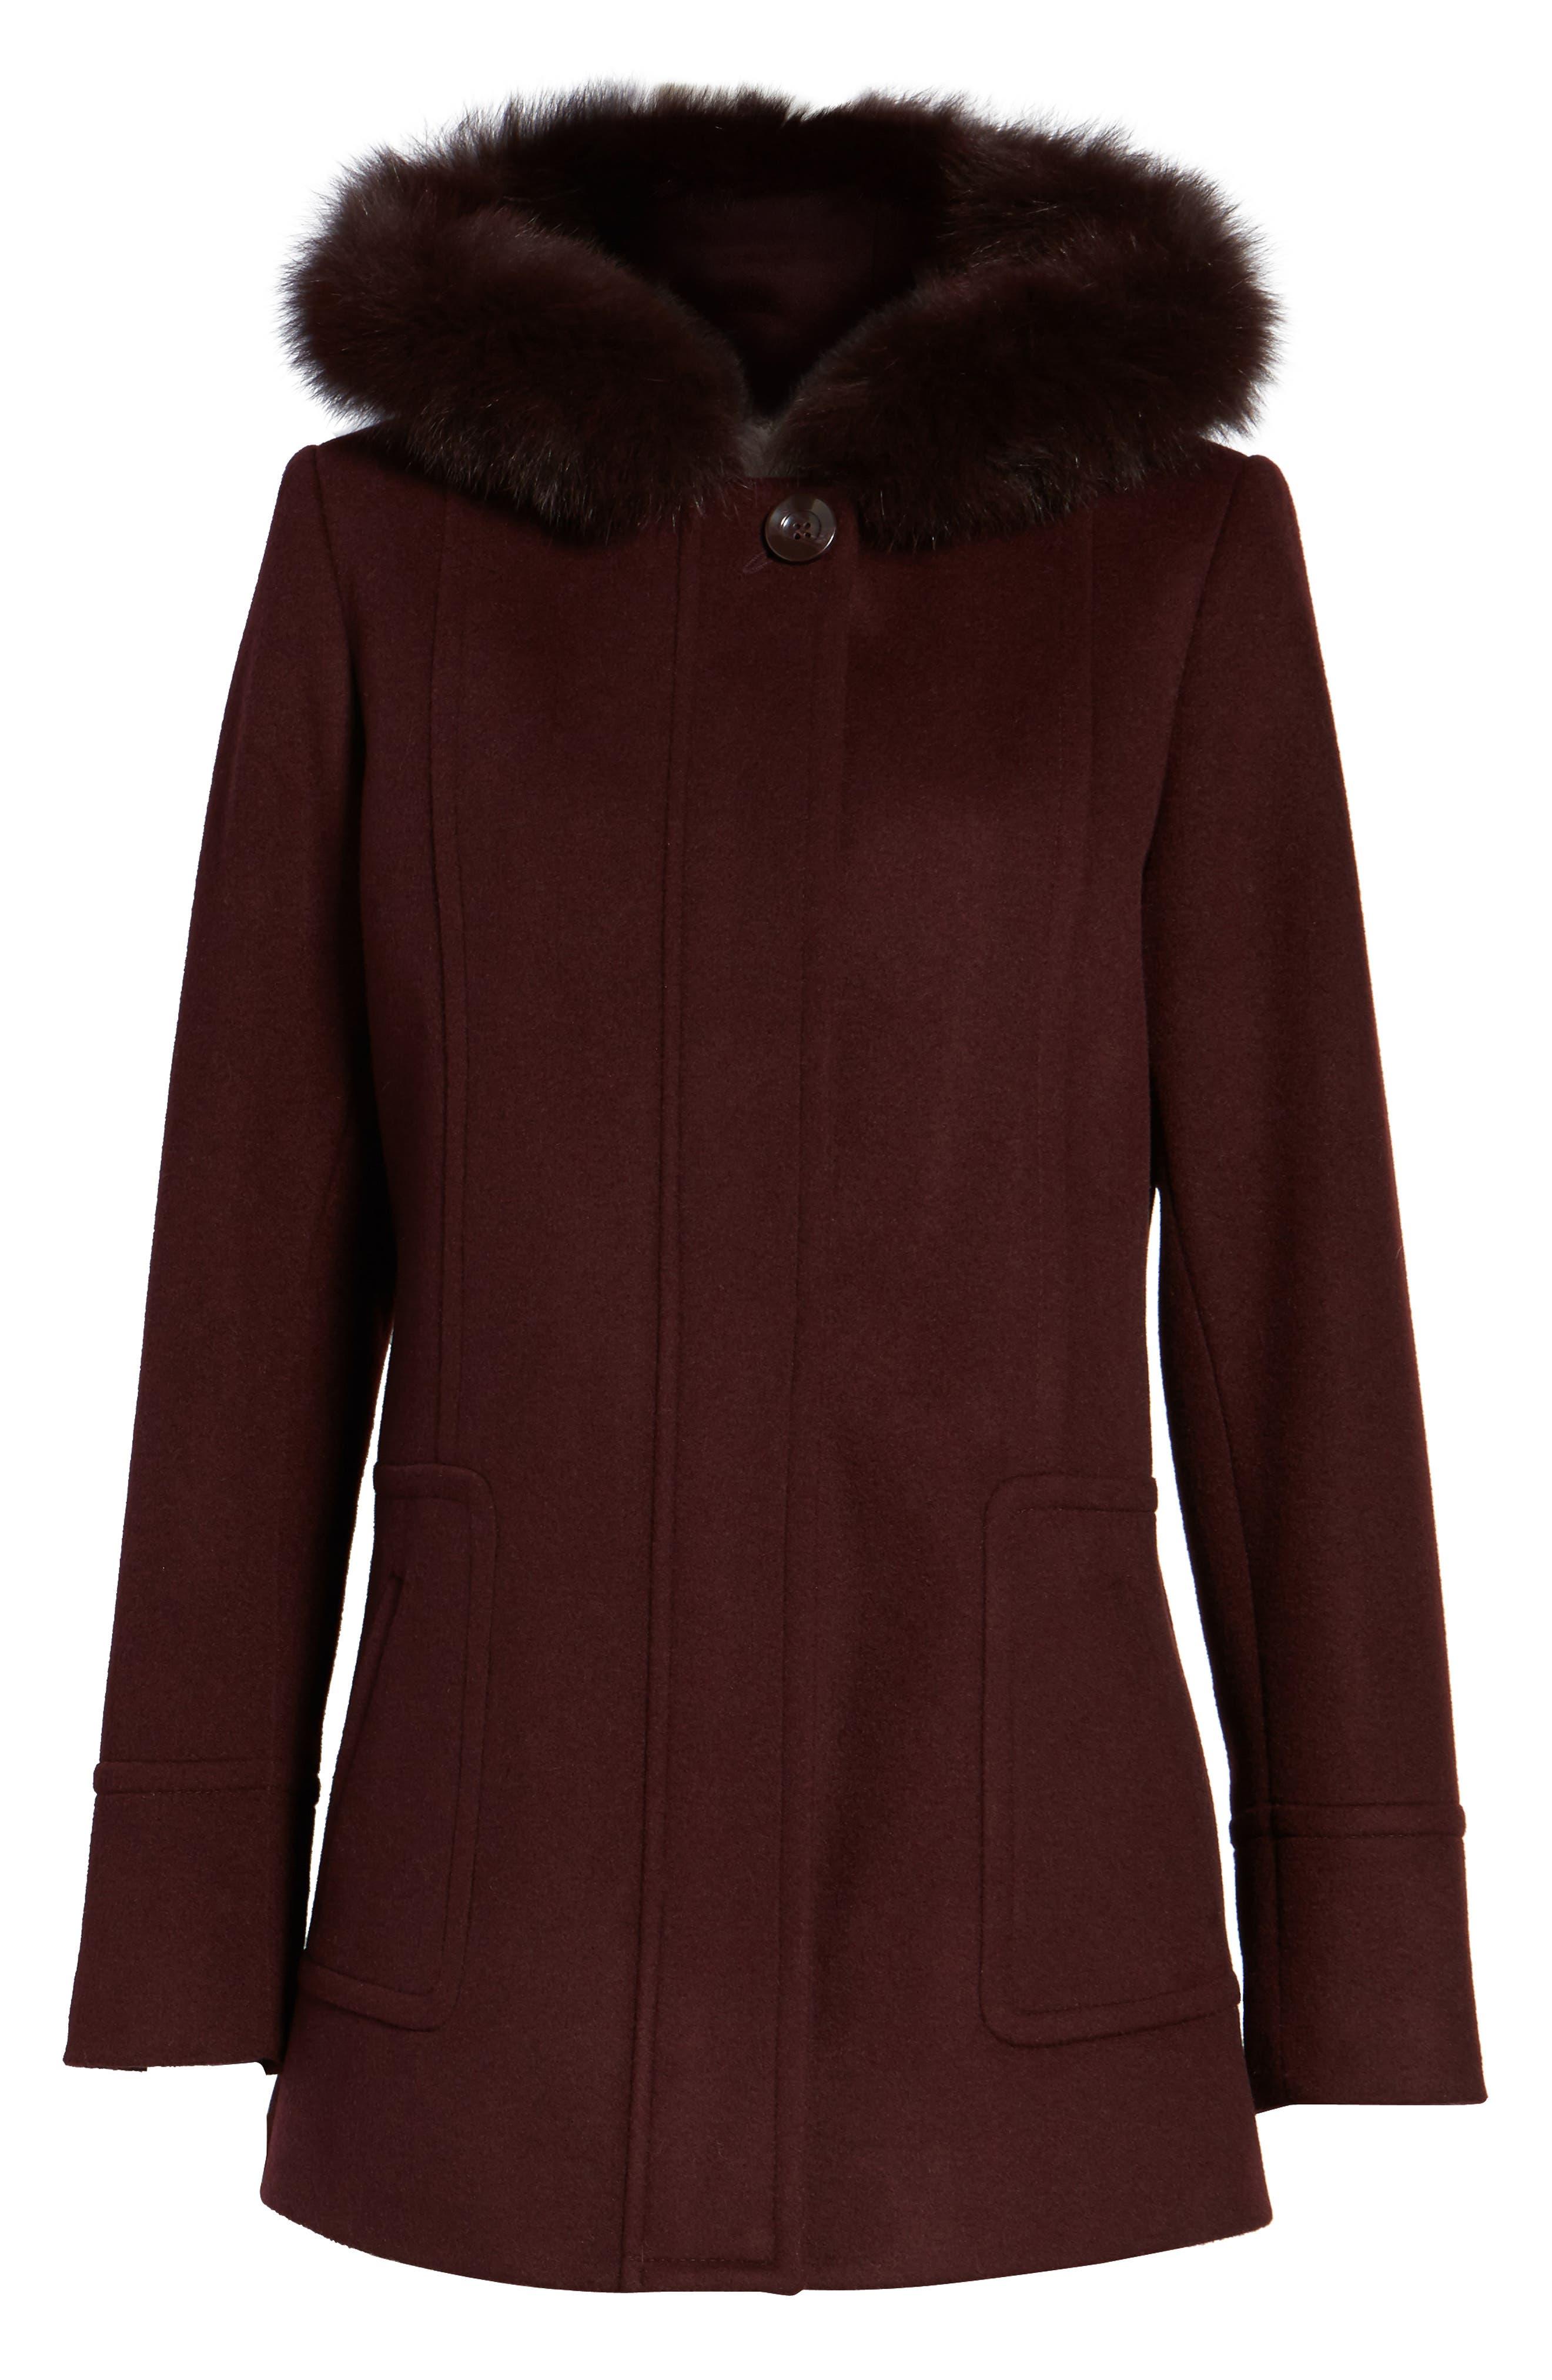 Hooded Wool Blend Coat with Genuine Fox Fur Trim,                             Alternate thumbnail 15, color,